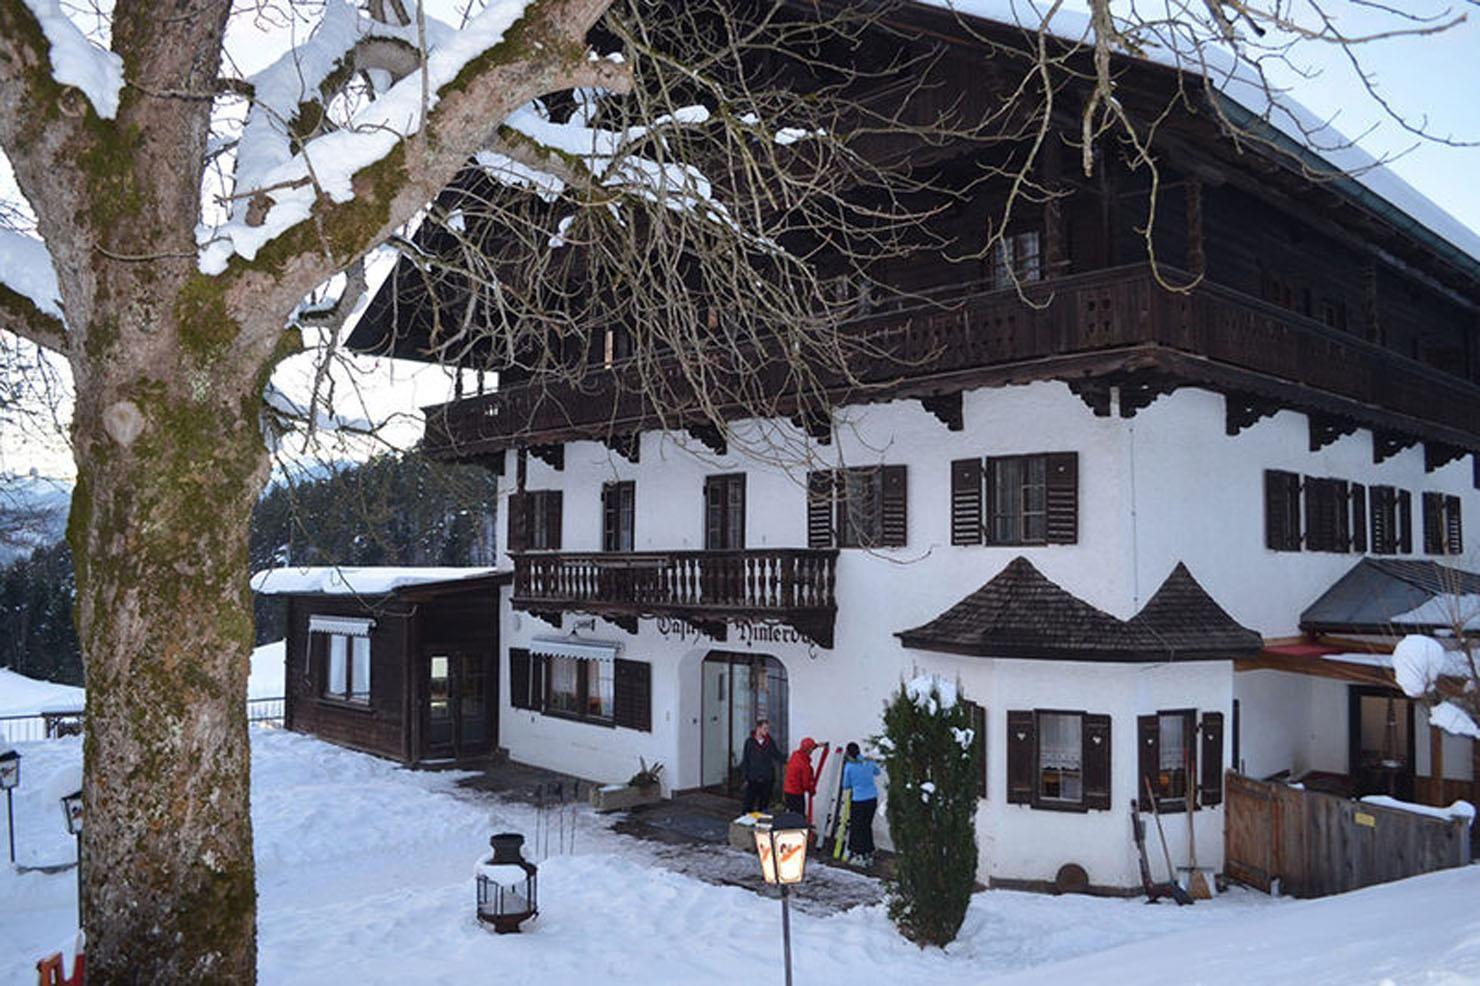 Berghotel Hinterduxerhof - Slide 1